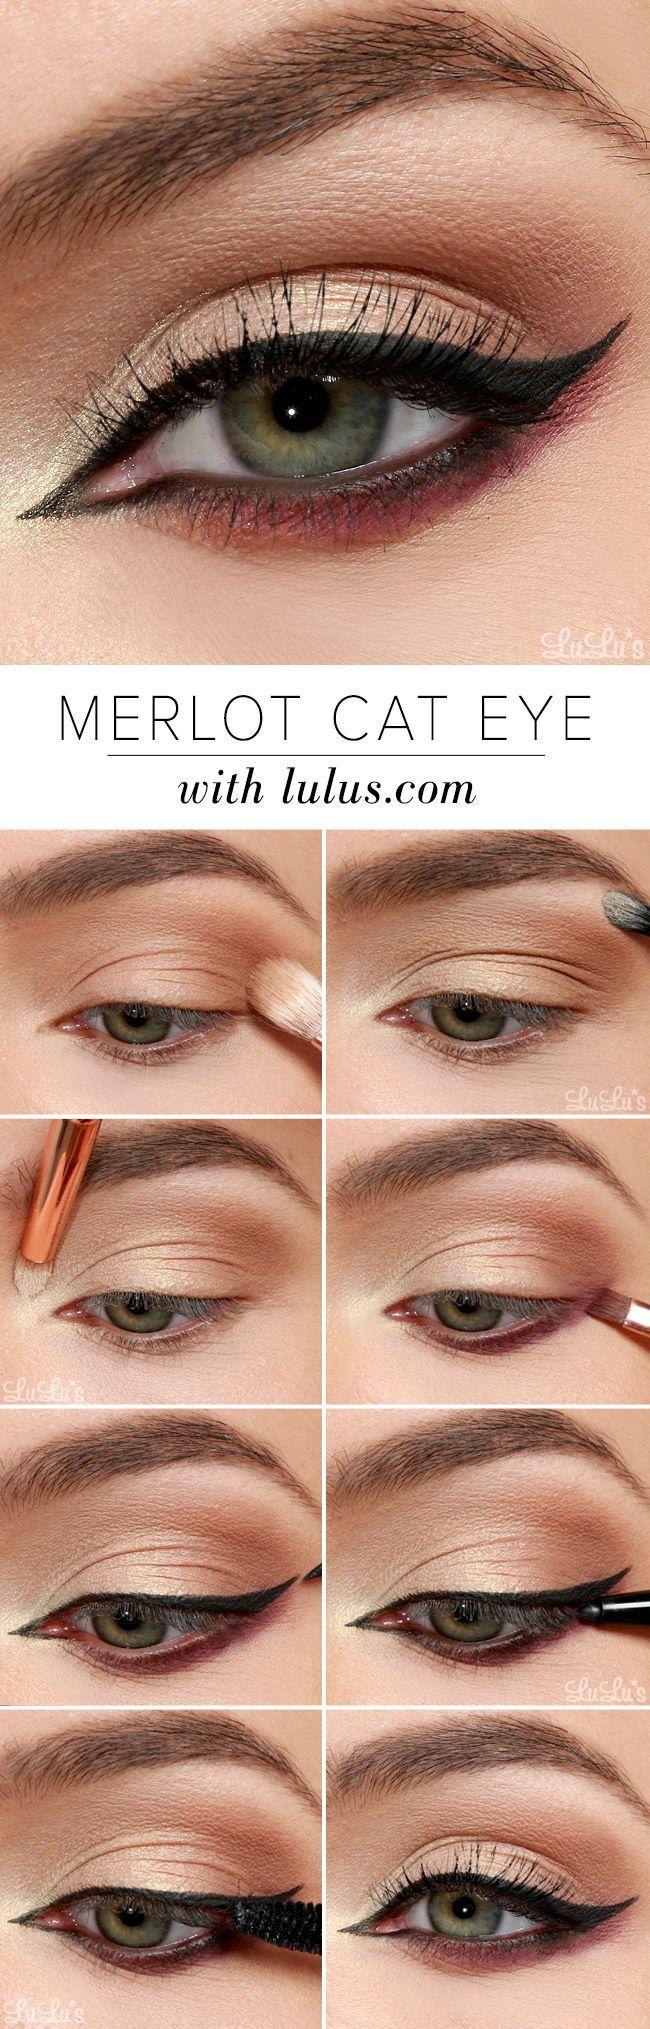 LuLu*s How-To: Merlot Cat Eye Makeup Tutorial at LuLus.com!